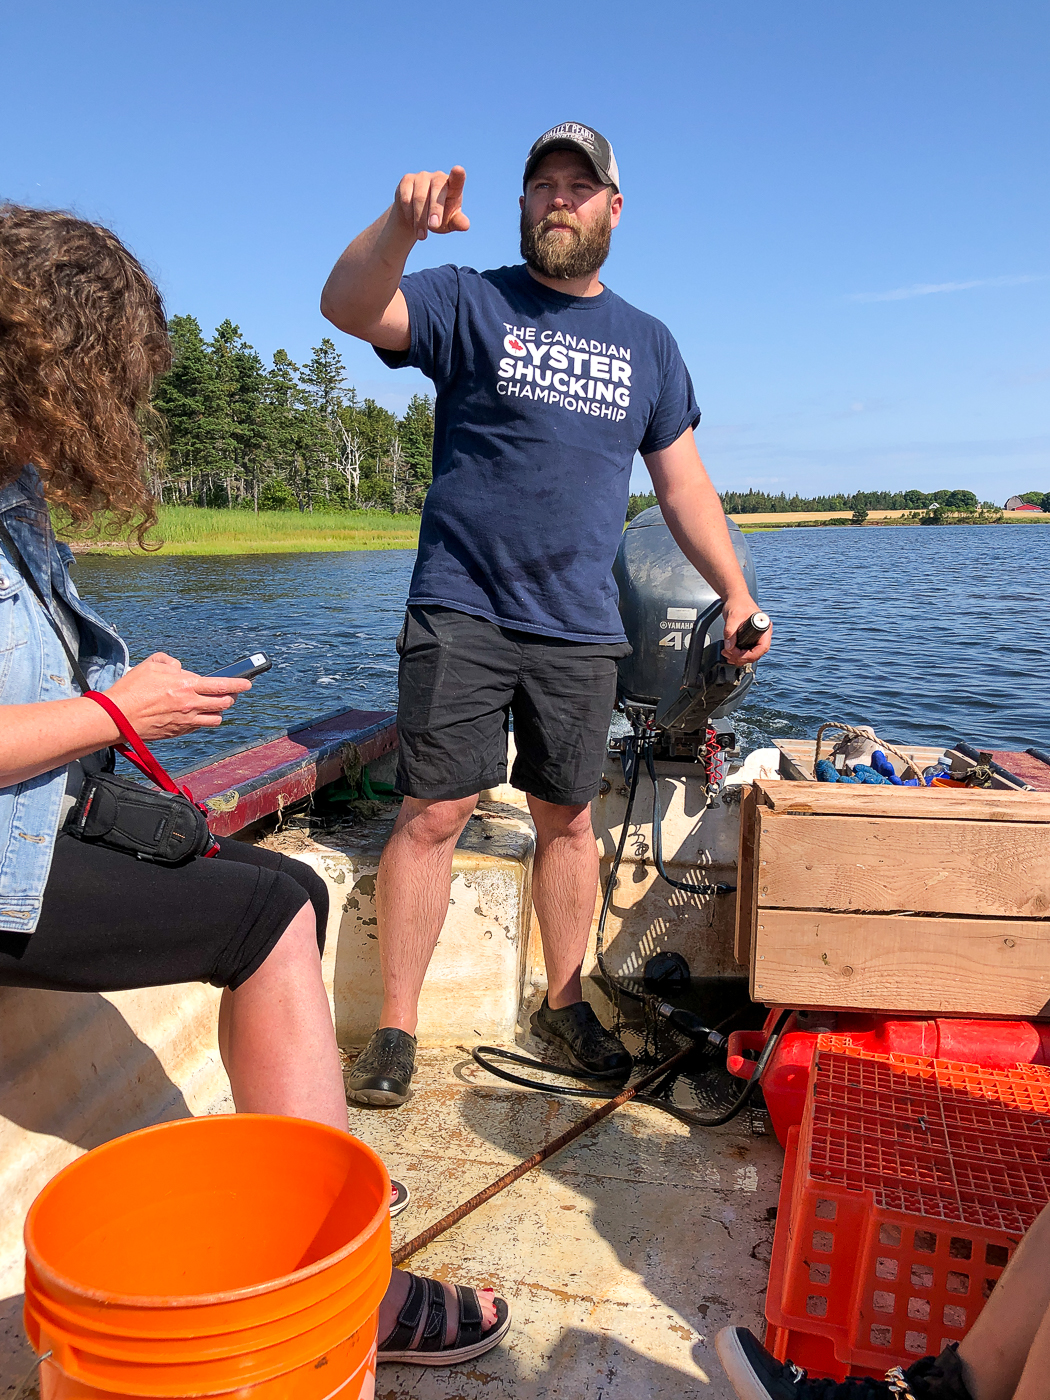 Jeff Noye en bateau - Excursion aux huîtres